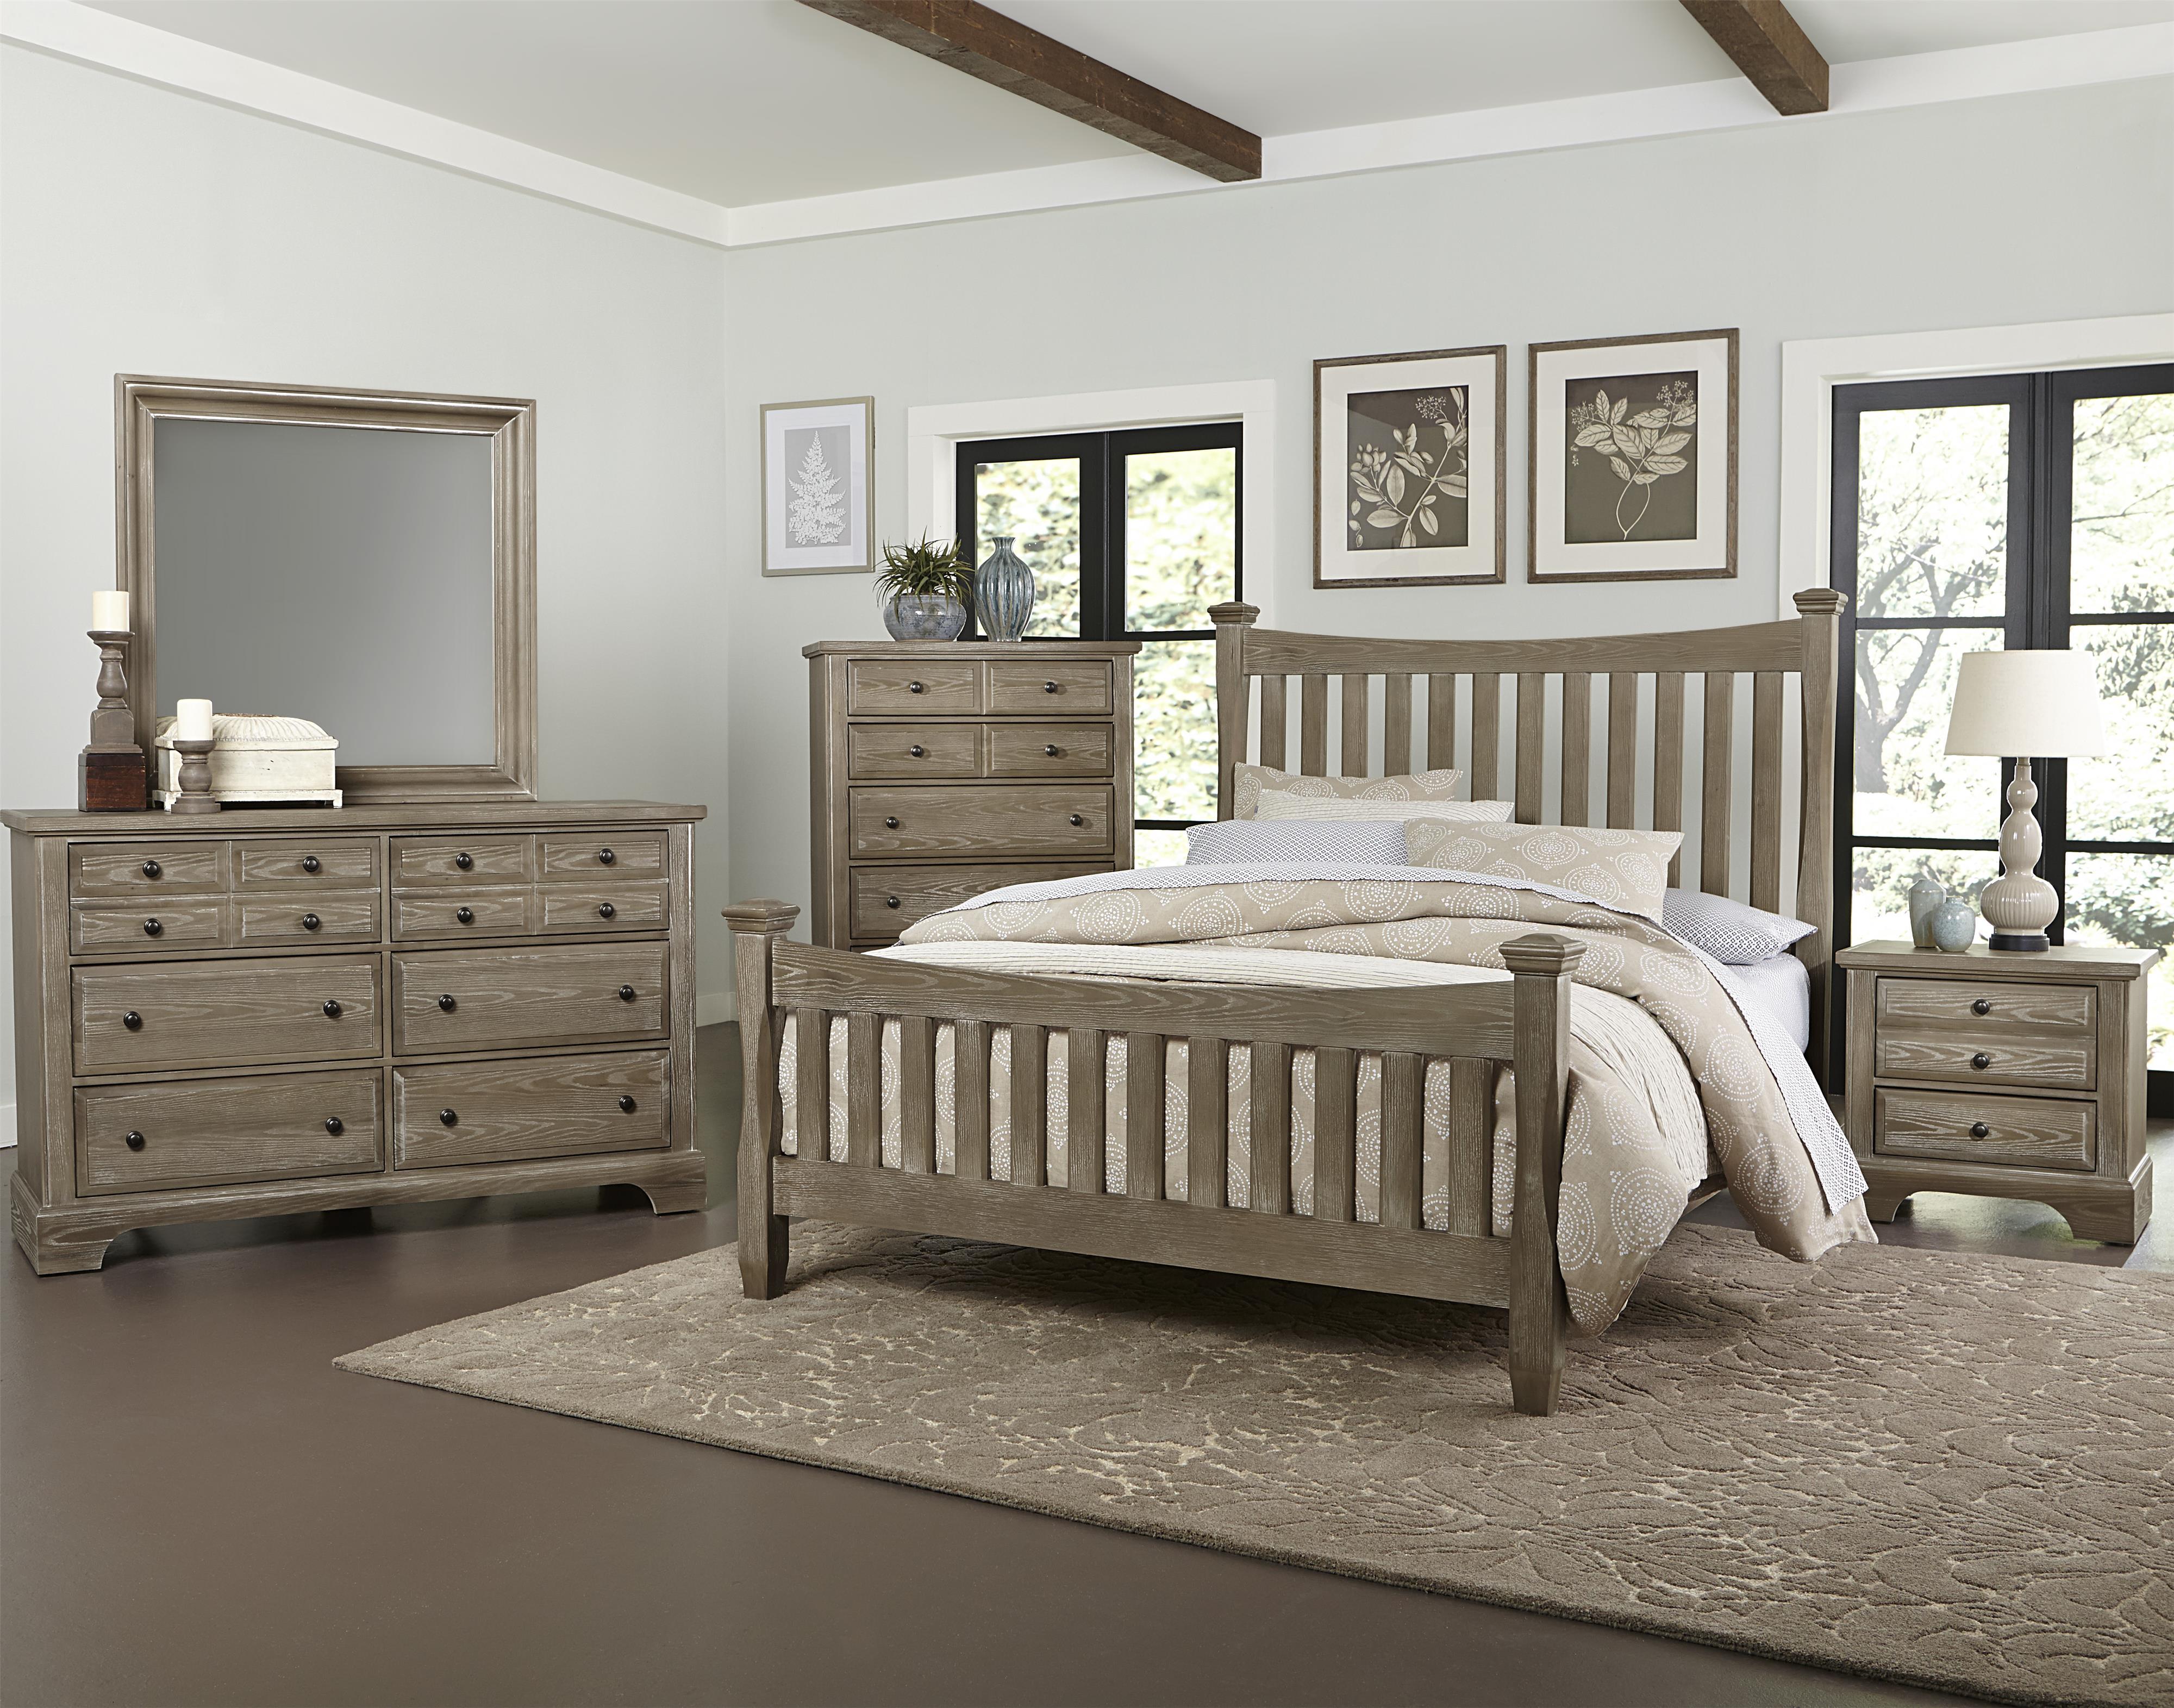 Vaughan Bassett Bedford King Bedroom Group - Item Number: BB81 K Bedroom Group 1